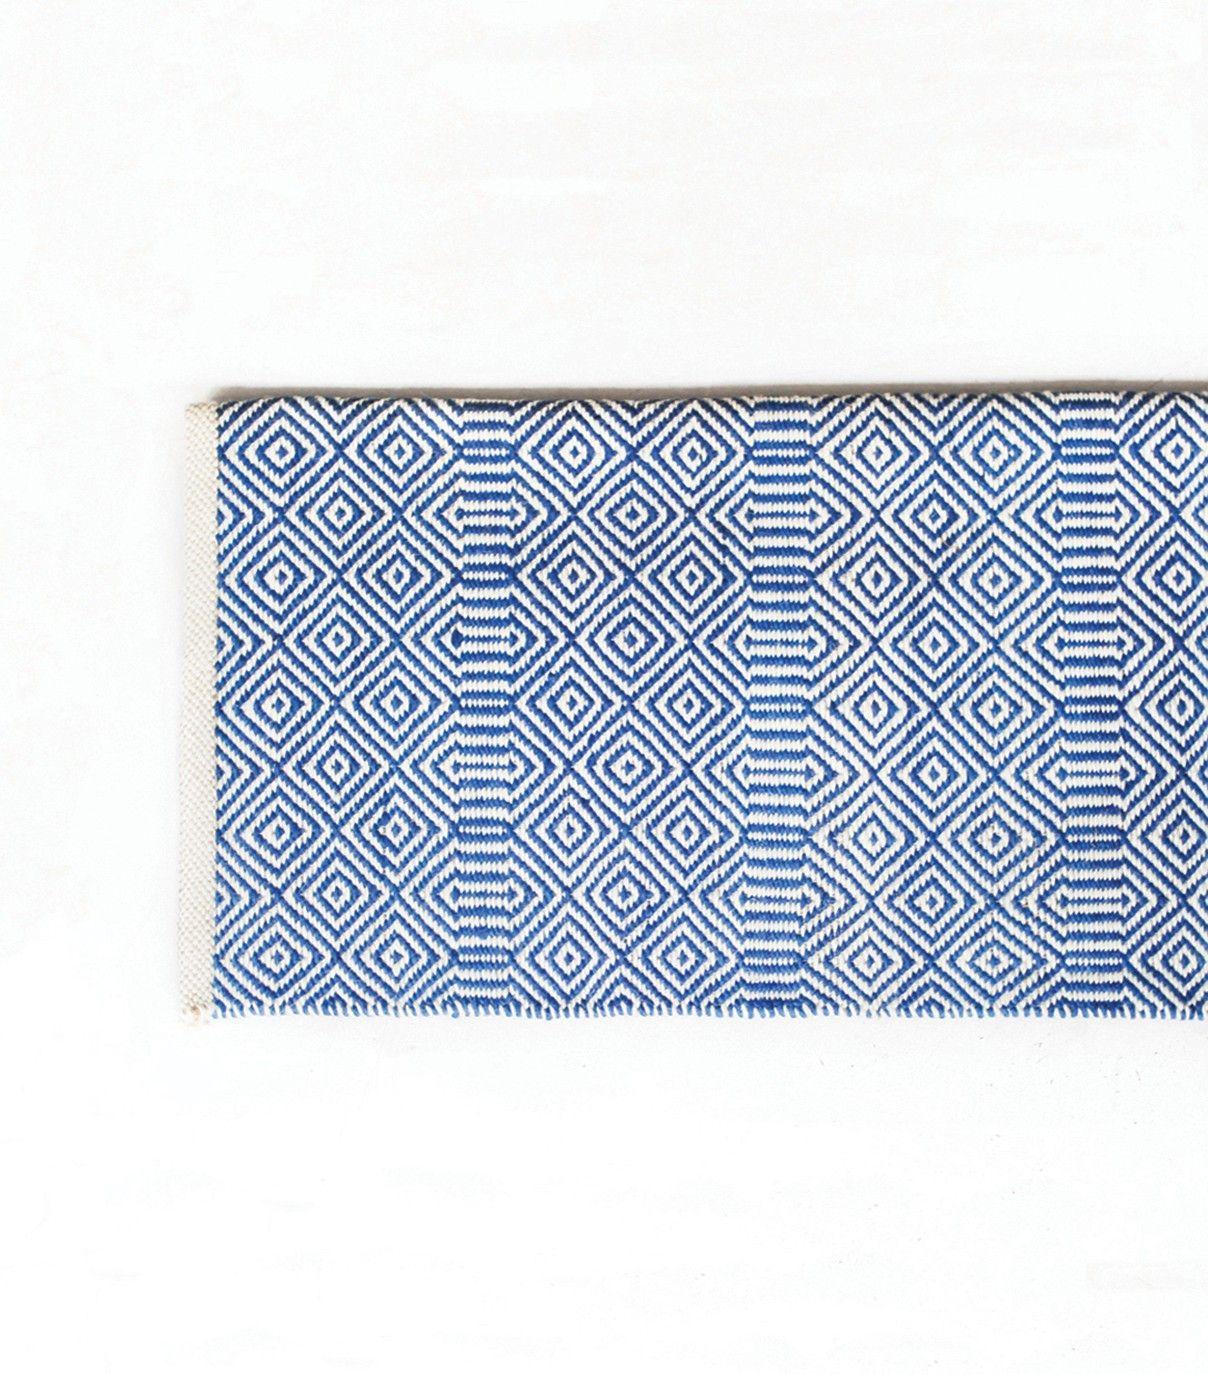 Tapis ethnique bleu et blanc 42x42 cm | Tapis | Pinterest ... - Tapis Laine Blanc